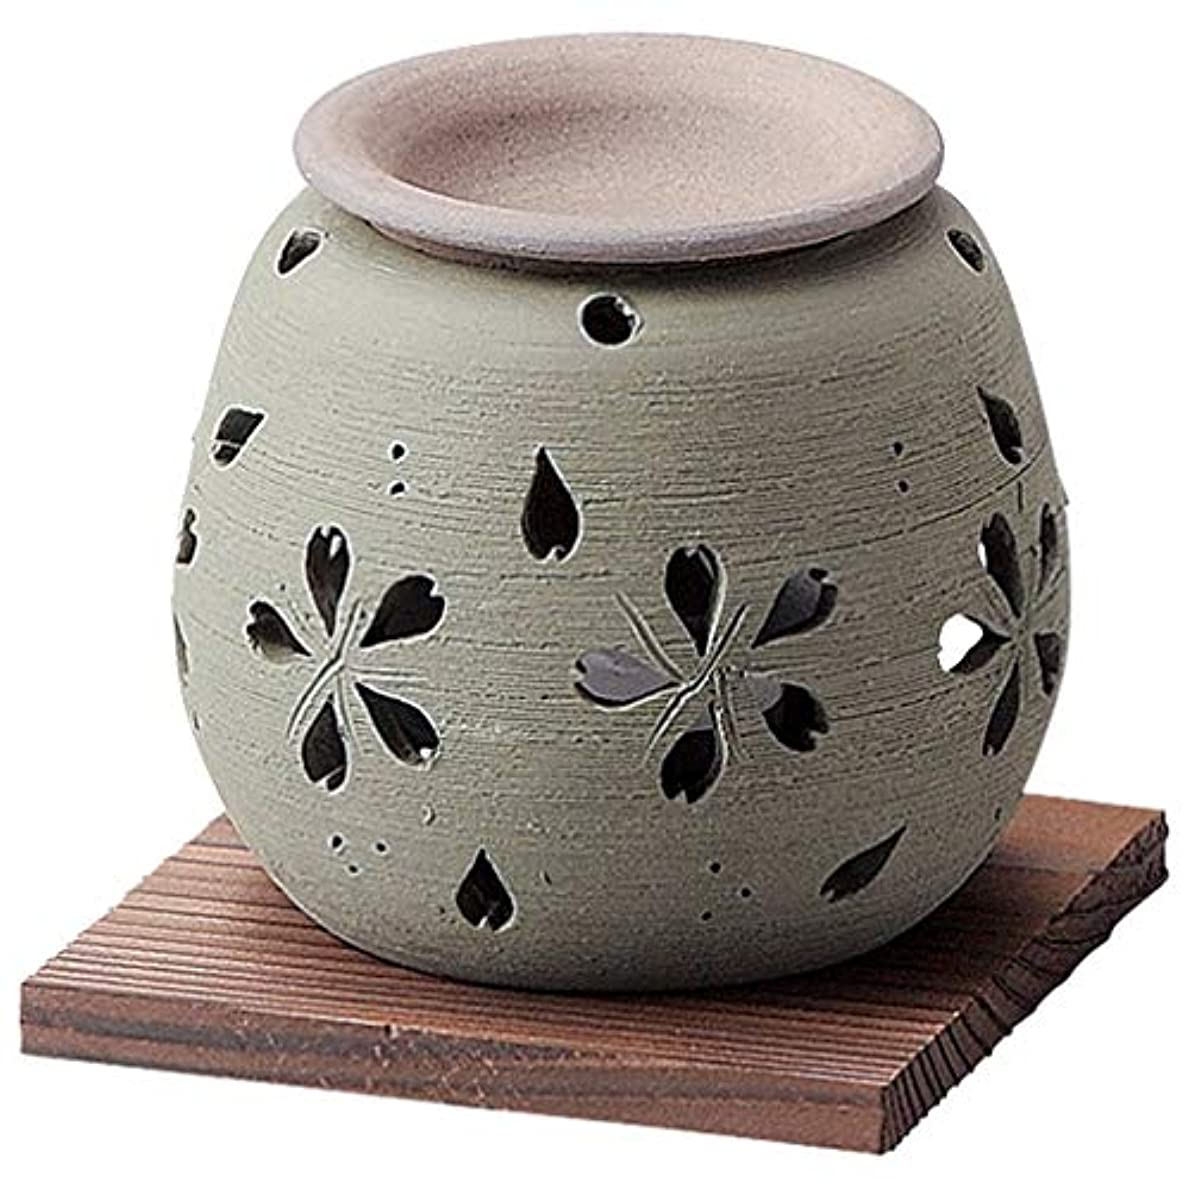 合理化褒賞構造お部屋の消臭に!■常滑焼【茶香炉】石龍作 緑桜茶香炉